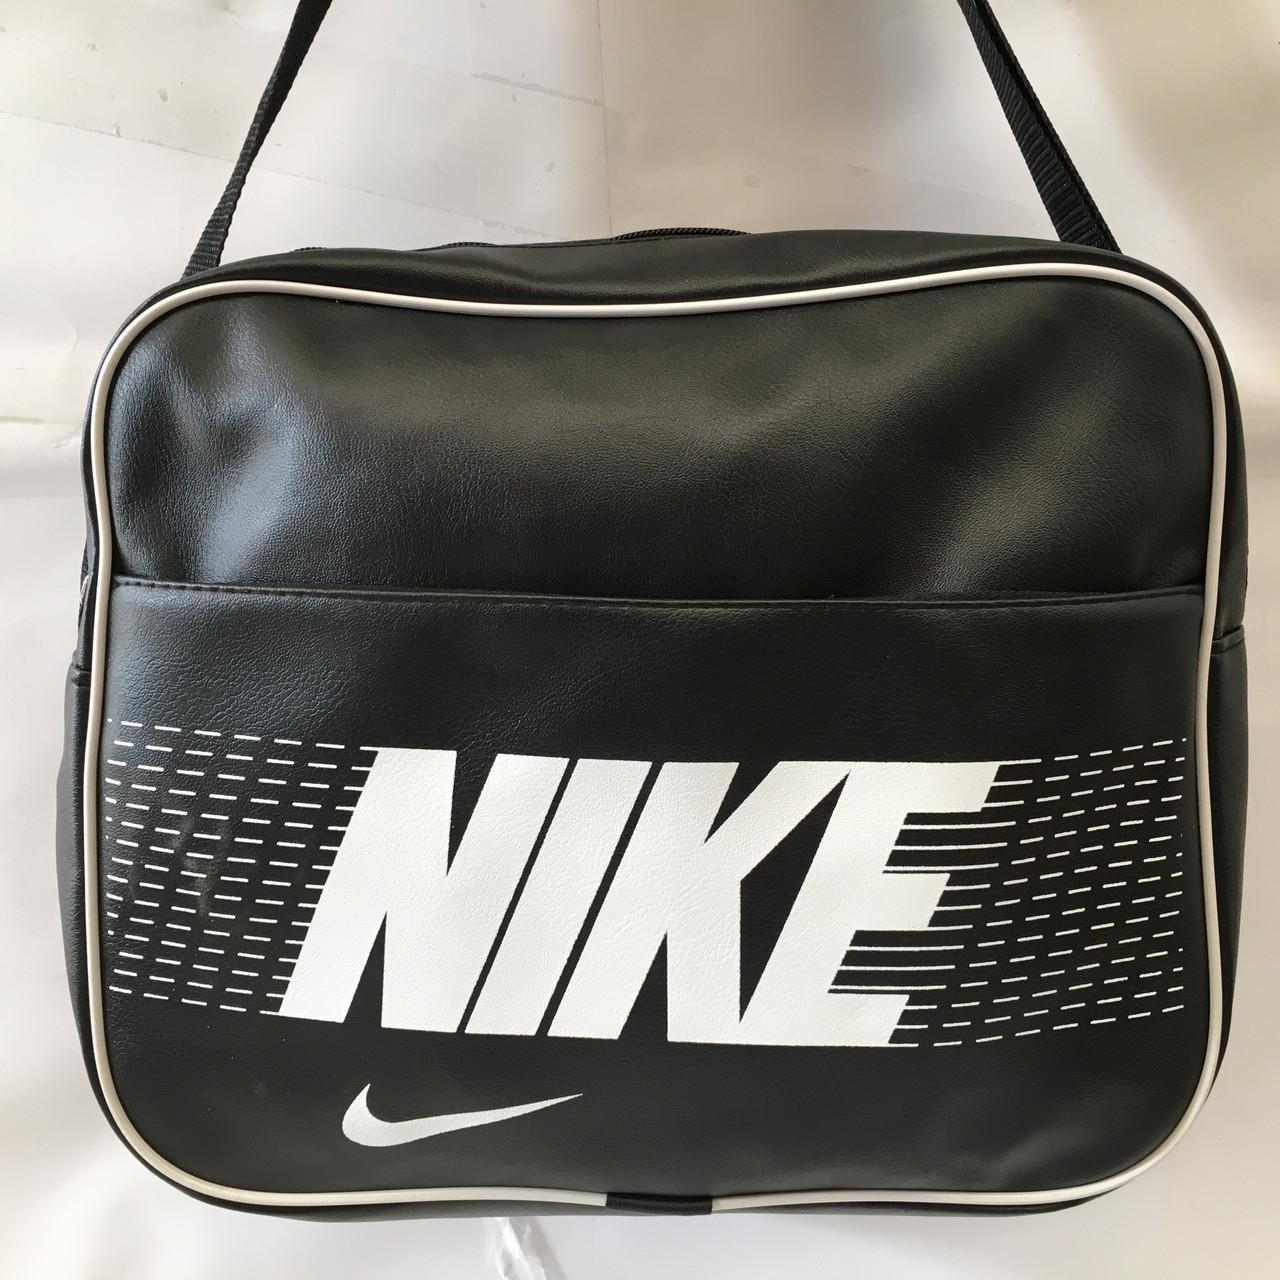 4aa44b06 Спортивная сумка Nike через плечо формат а4 черная оптом: продажа ...